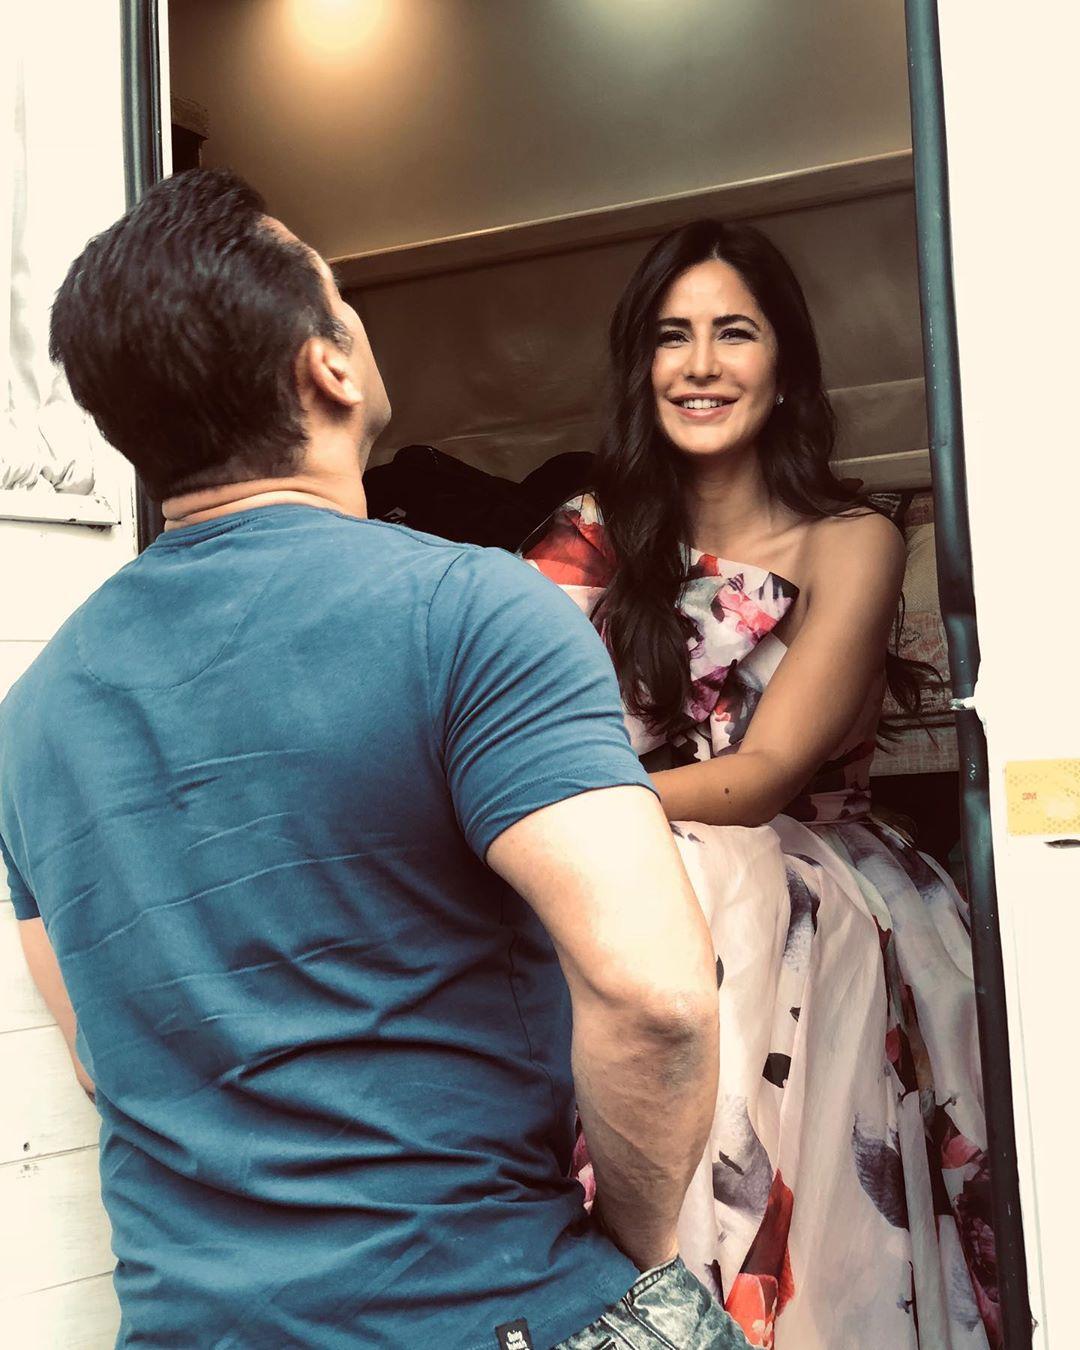 Bollywood Tadka,कैटरीना कैफ इमेज,कैटरीना कैफ फोटो,कैटरीना कैफ पिक्चर,सलमान खान इमेज, सलमान खान फोटो,सलमान खान पिक्चर